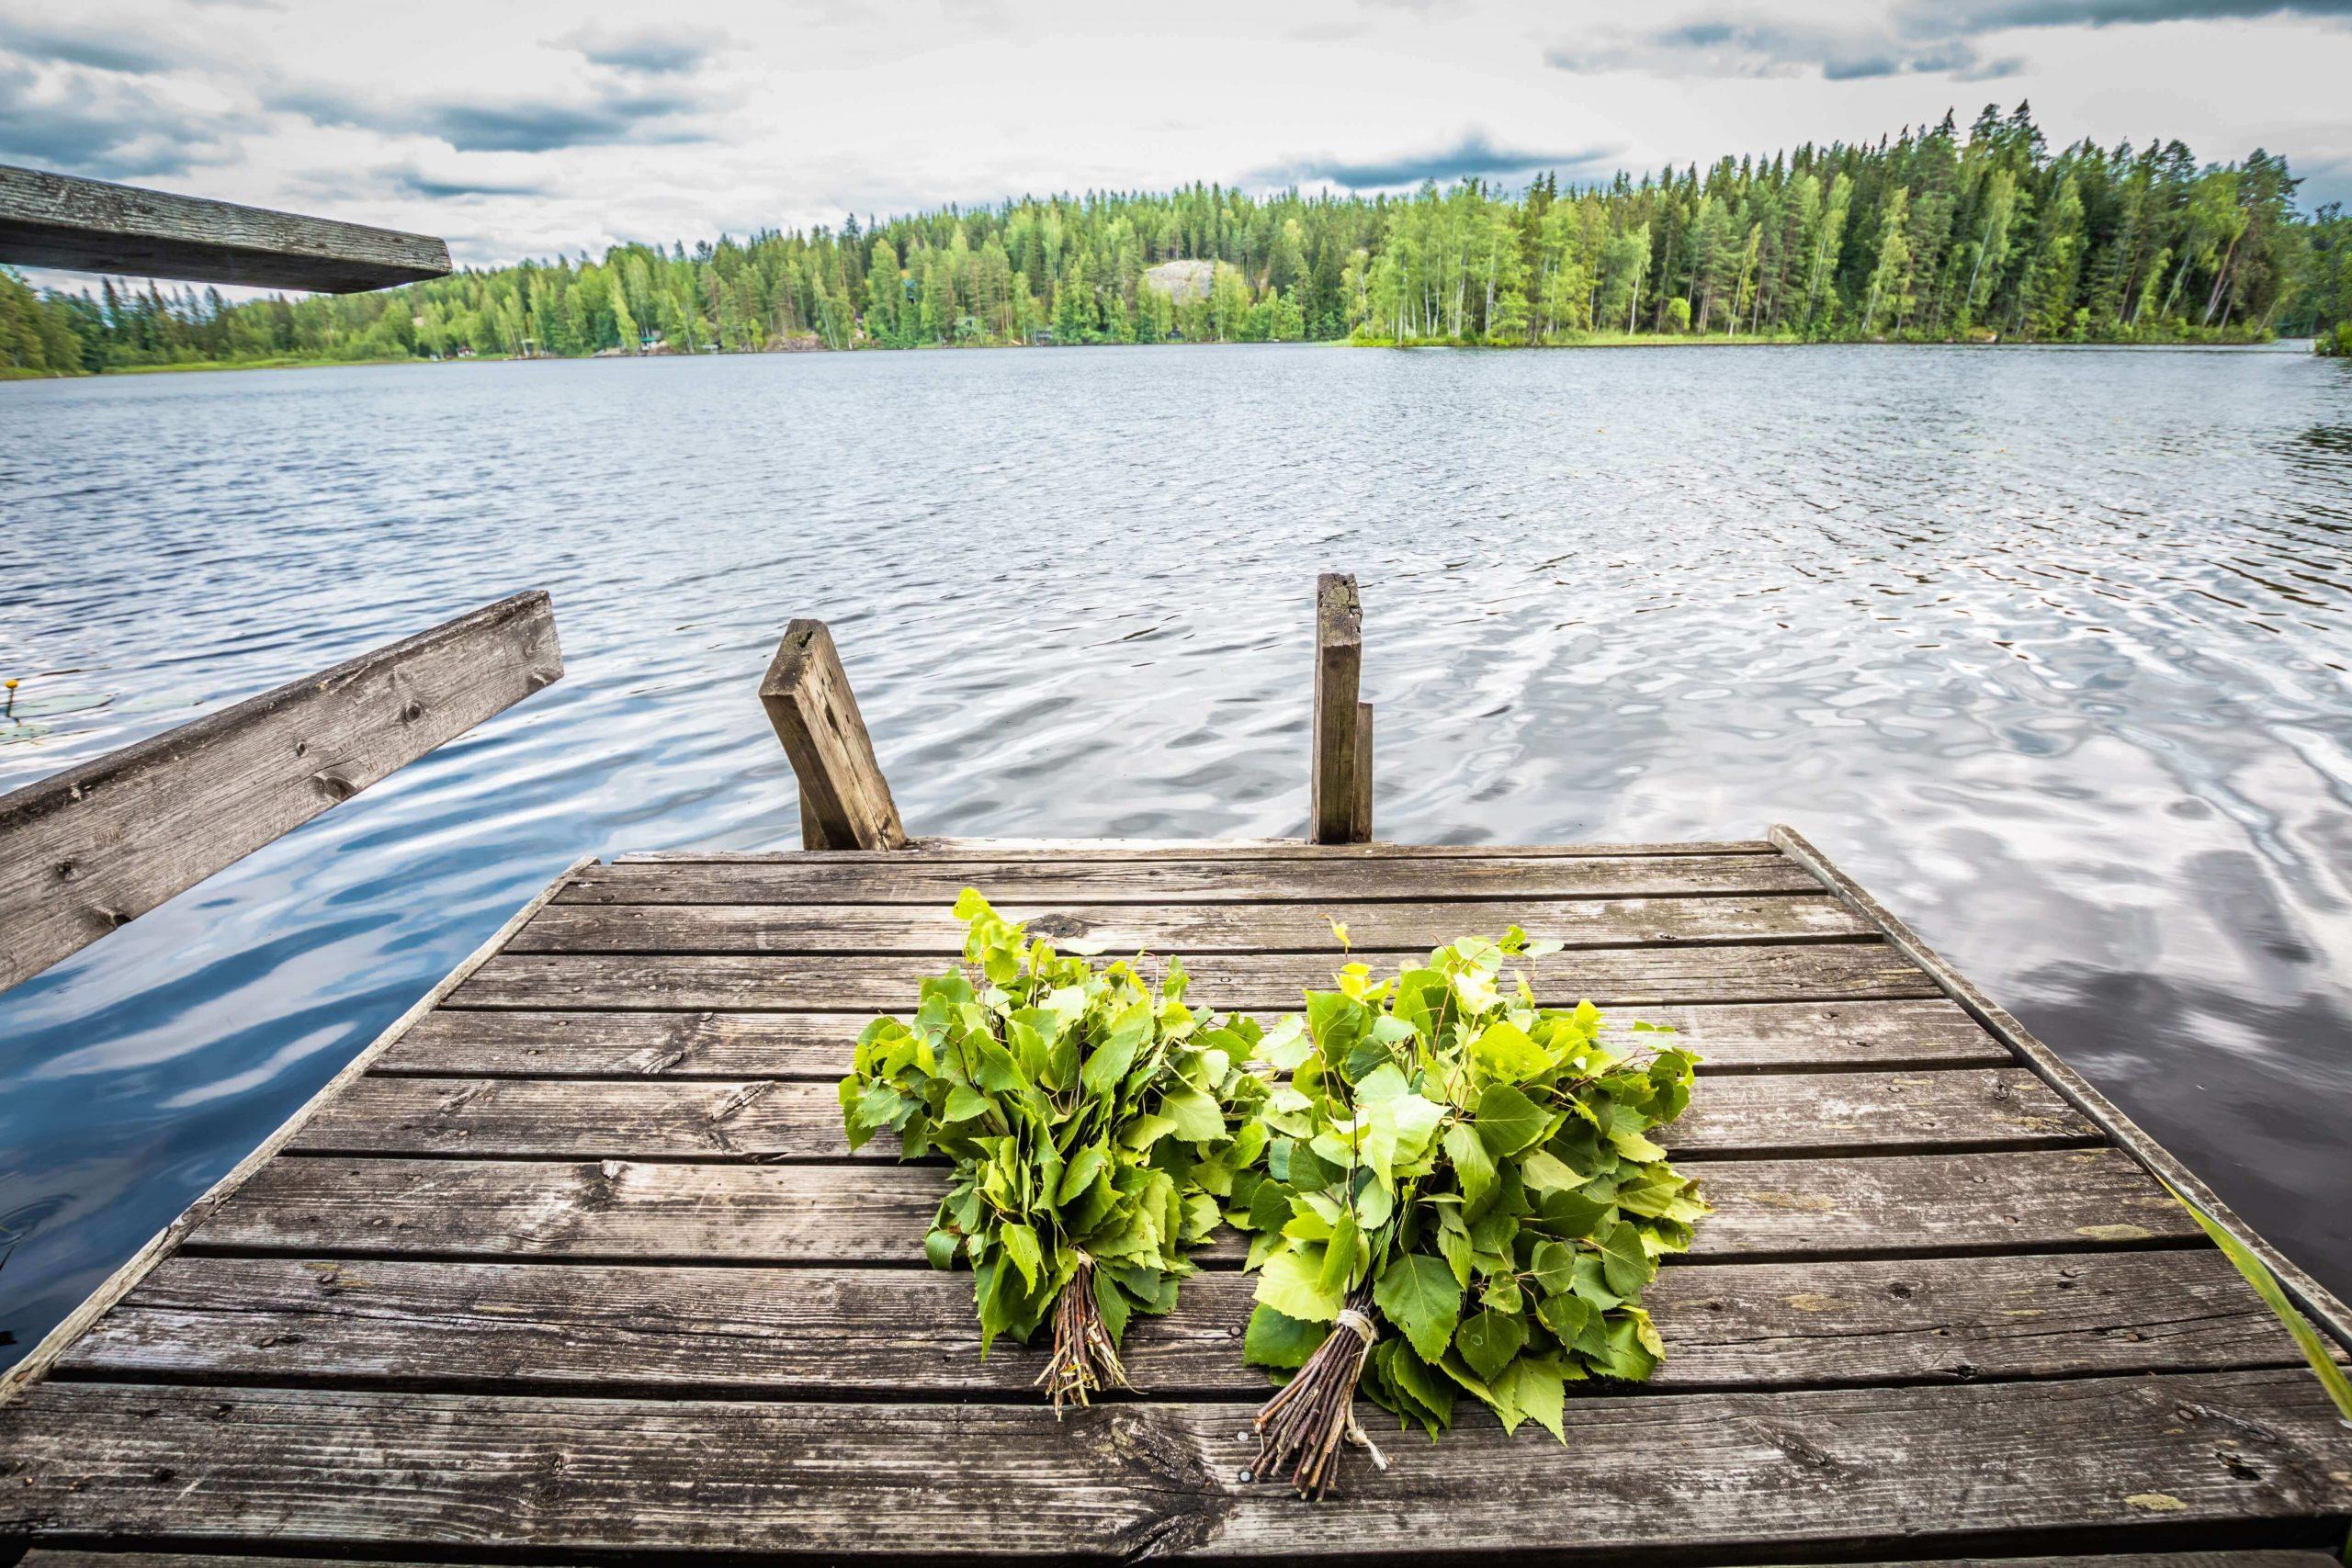 blog 4 sauna aloittelijoille